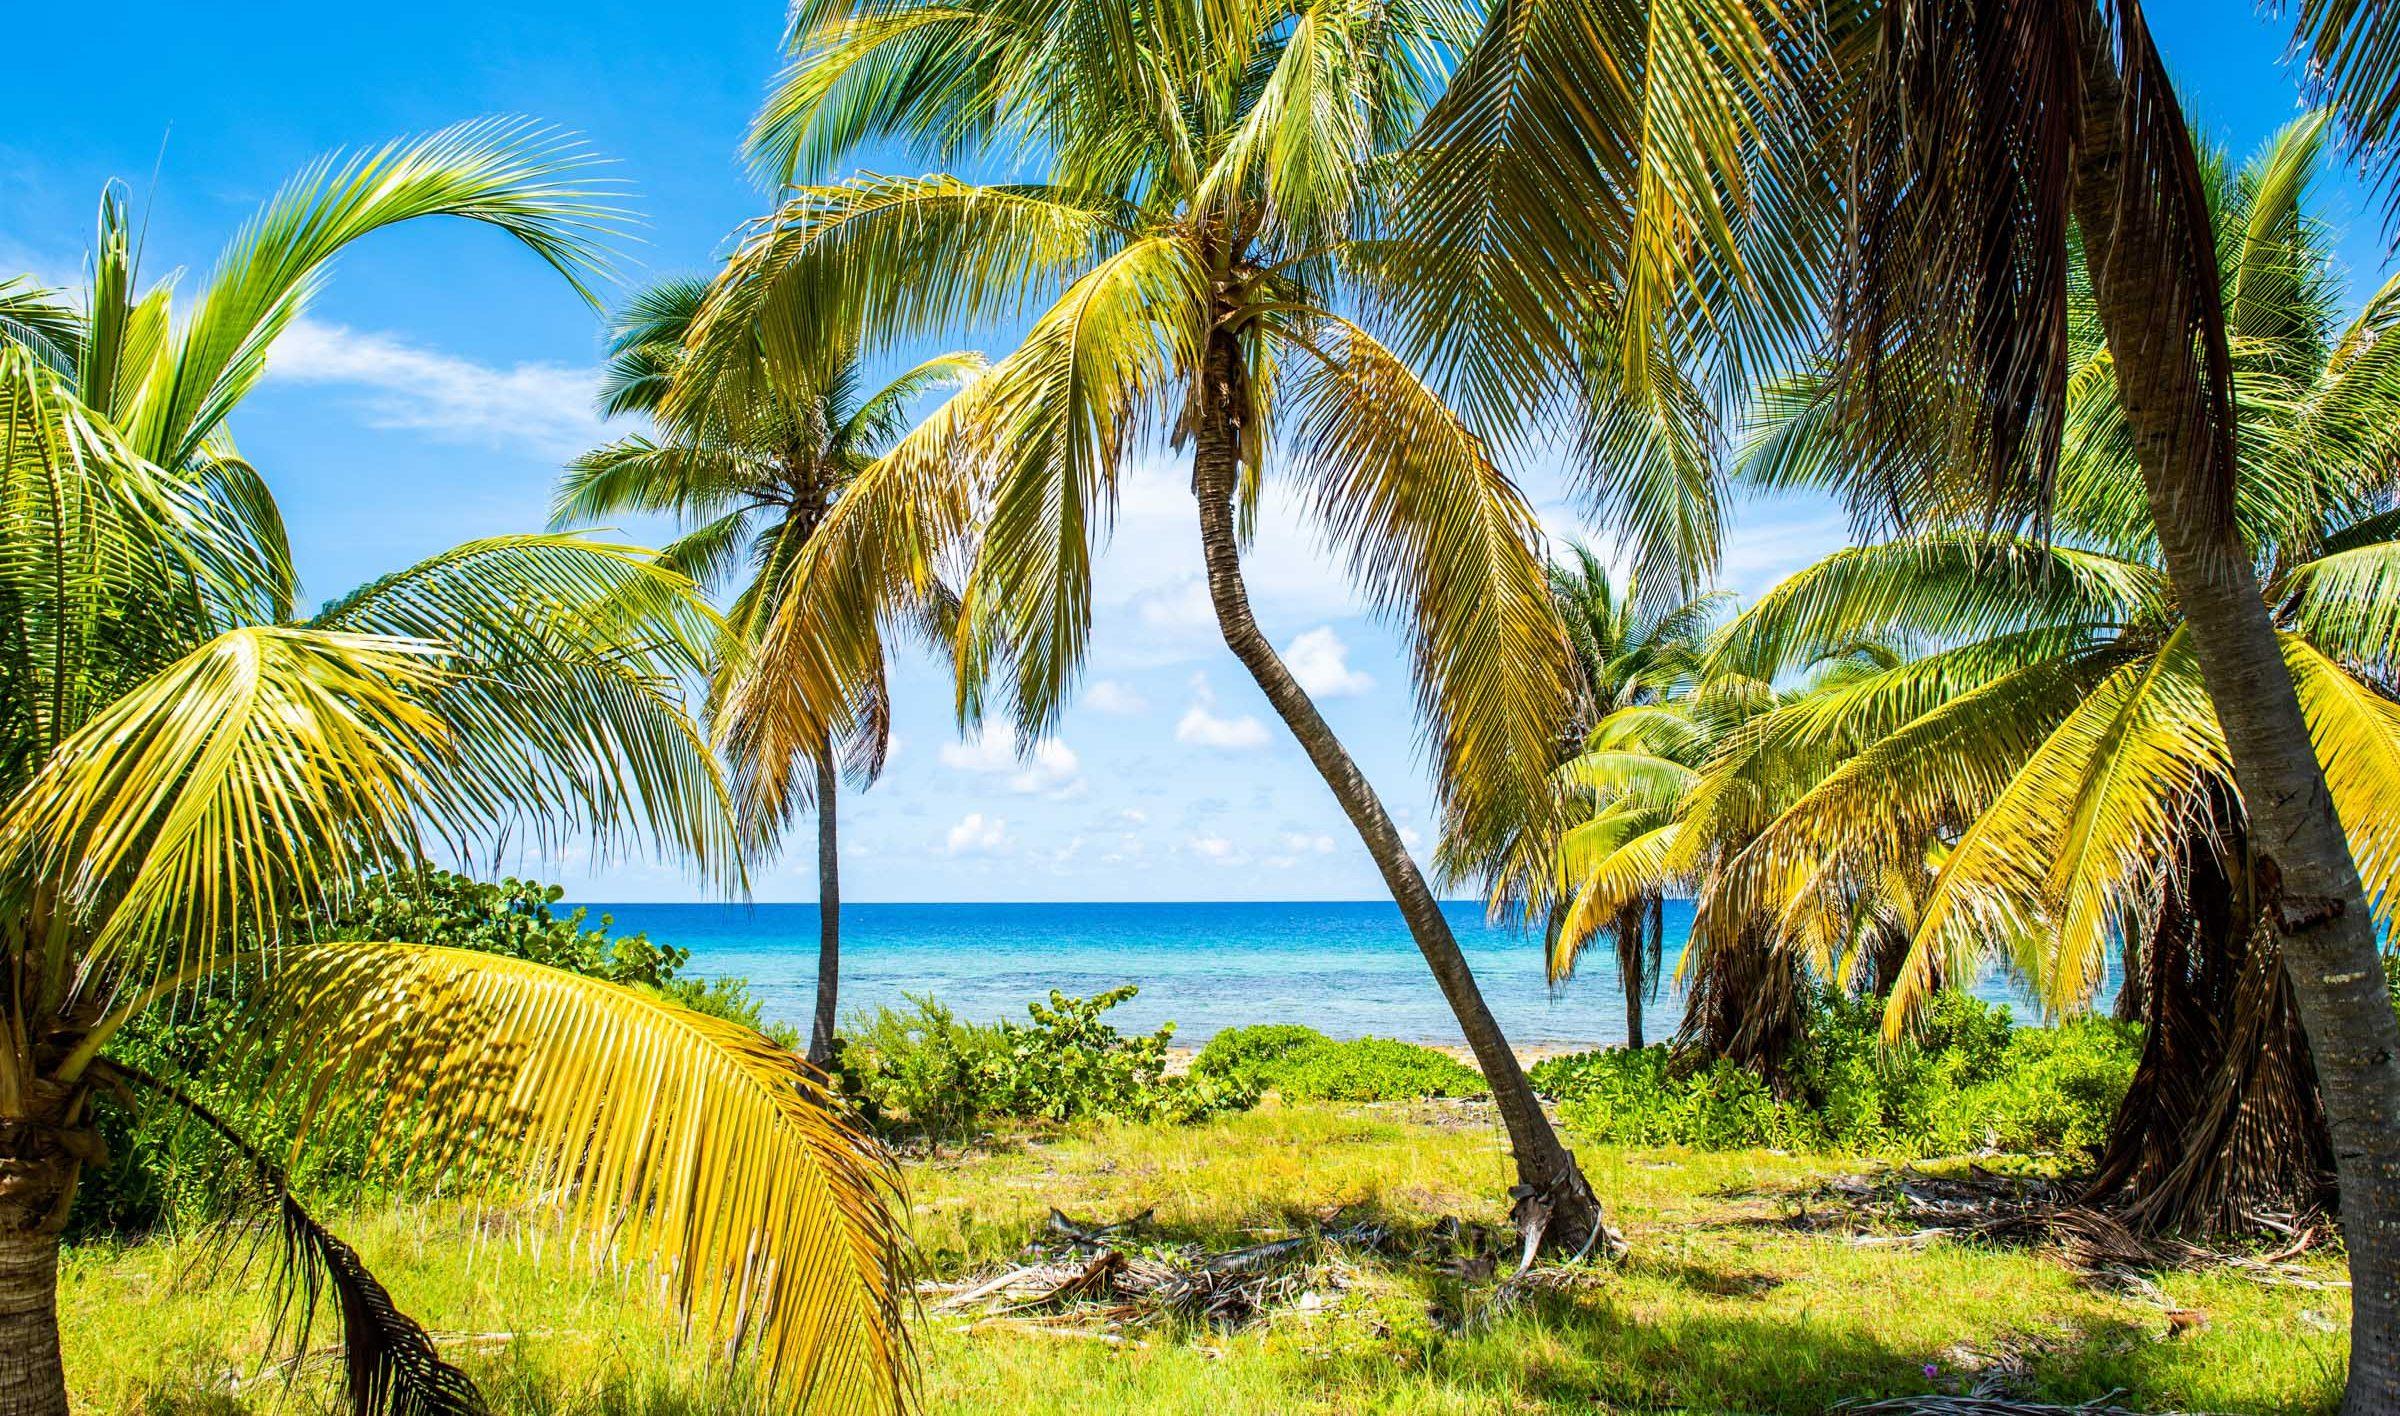 Life on Cayman Brac